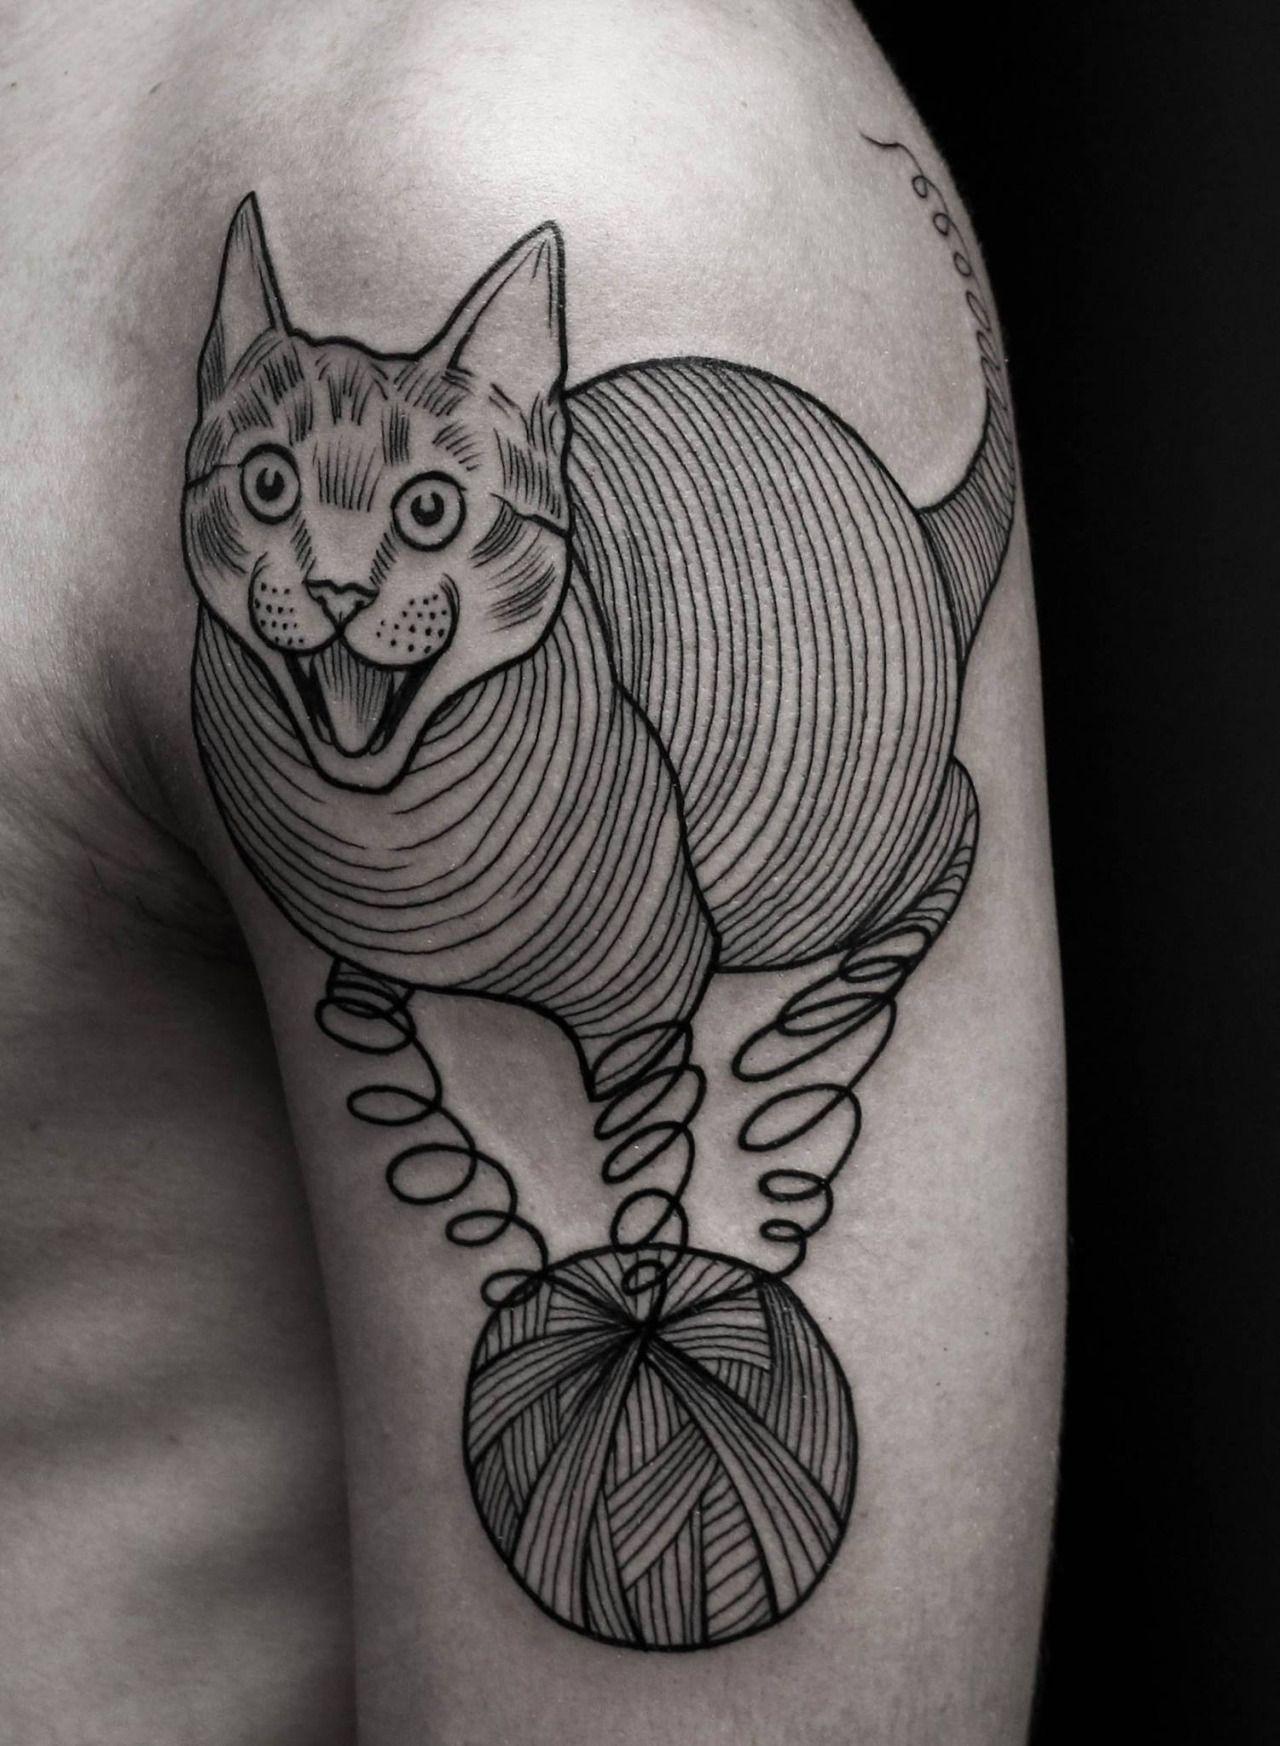 Skin deep tales roman broslavskiy cat tattoos pinterest